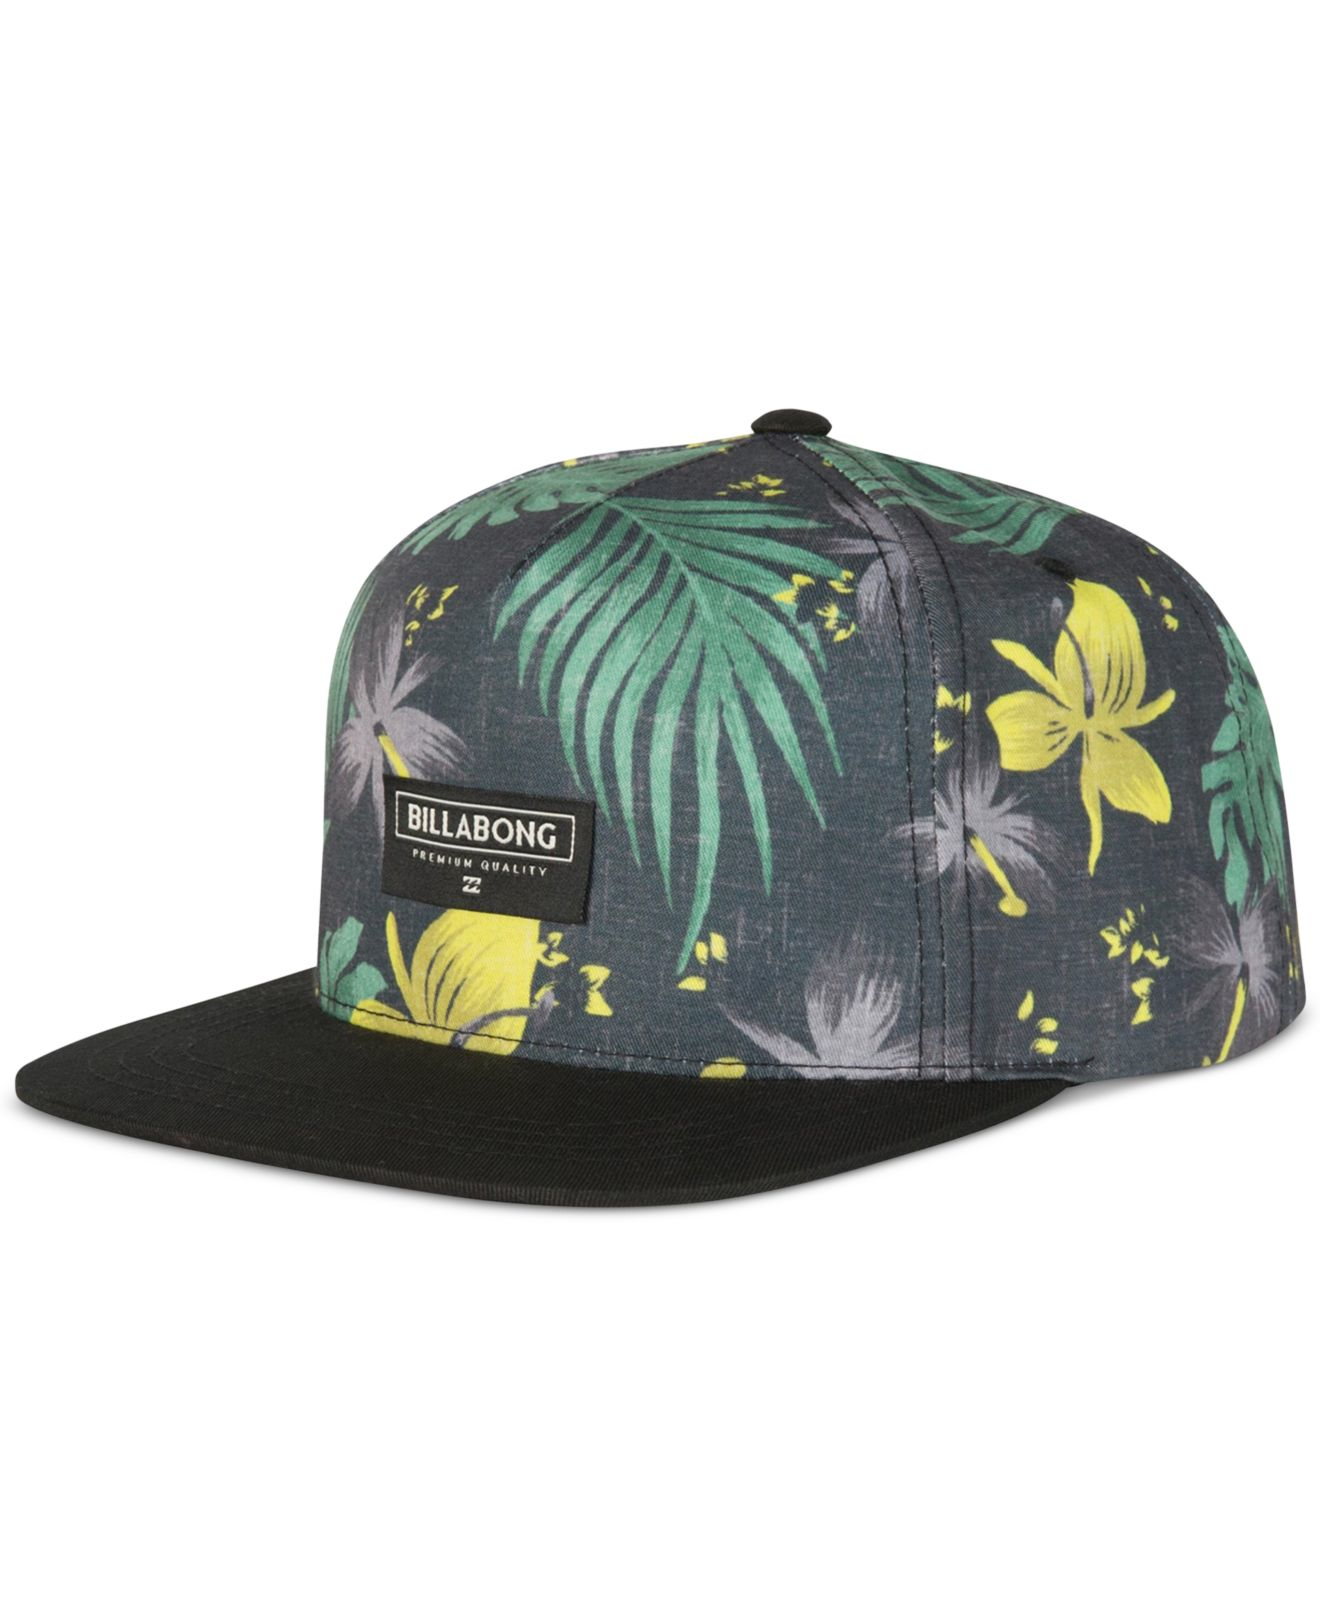 7e17ce44774 50% off lyst billabong sly floral print snapback hat in black for men e4039  ded40